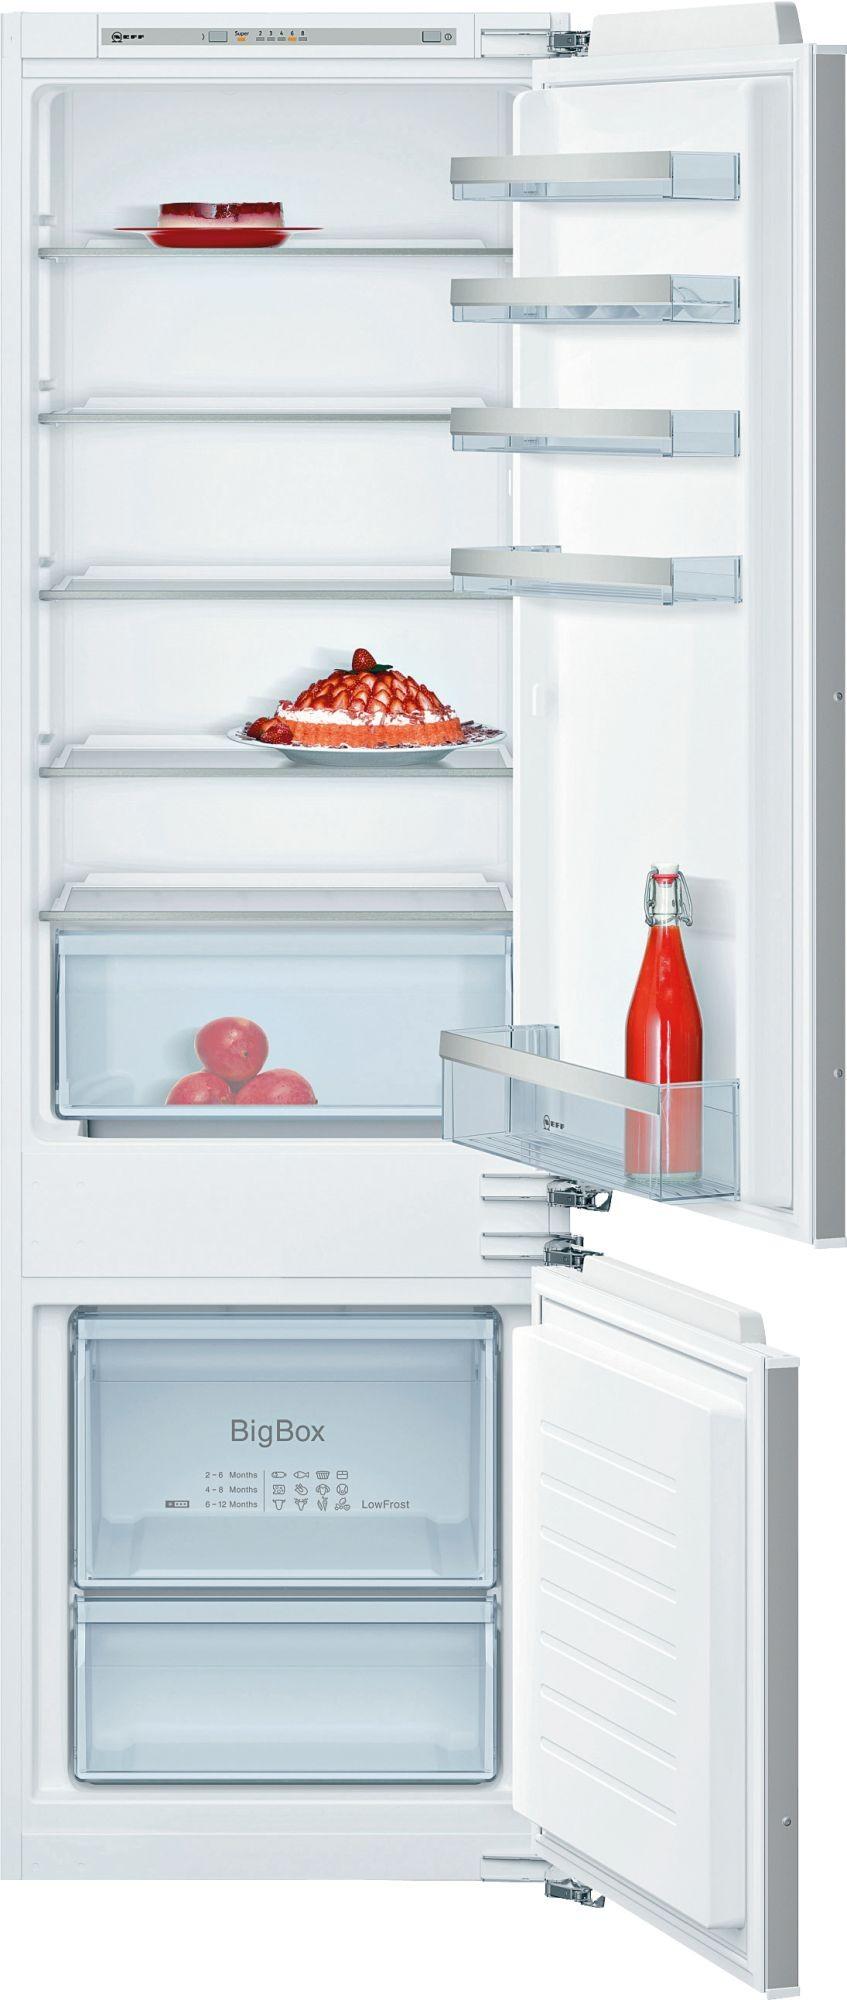 teamsix kg 815 a2 neff combinati frigo congelatore da incasso. Black Bedroom Furniture Sets. Home Design Ideas